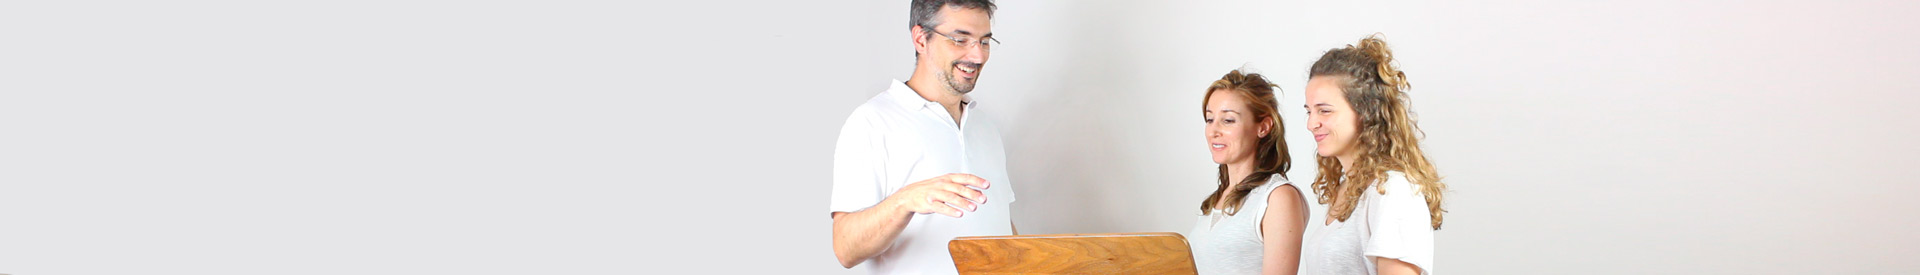 clases de canto madrid